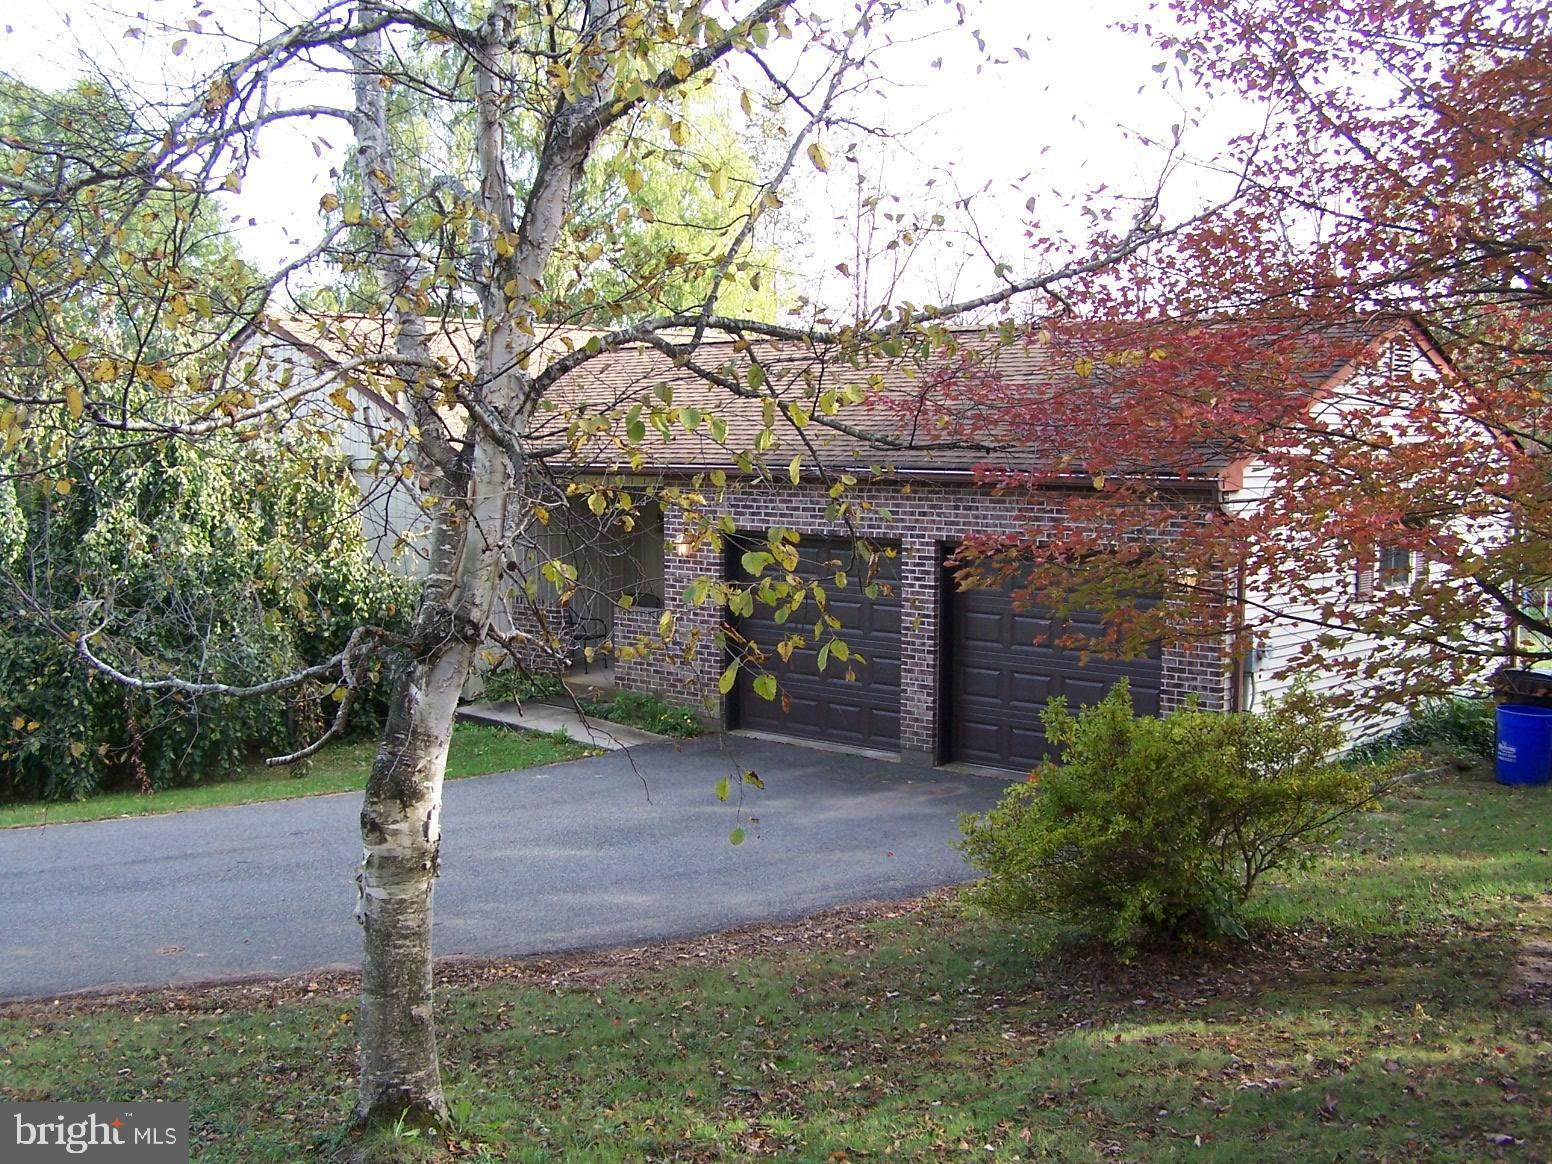 1178 PEEVY ROAD, EAST GREENVILLE, PA 18041